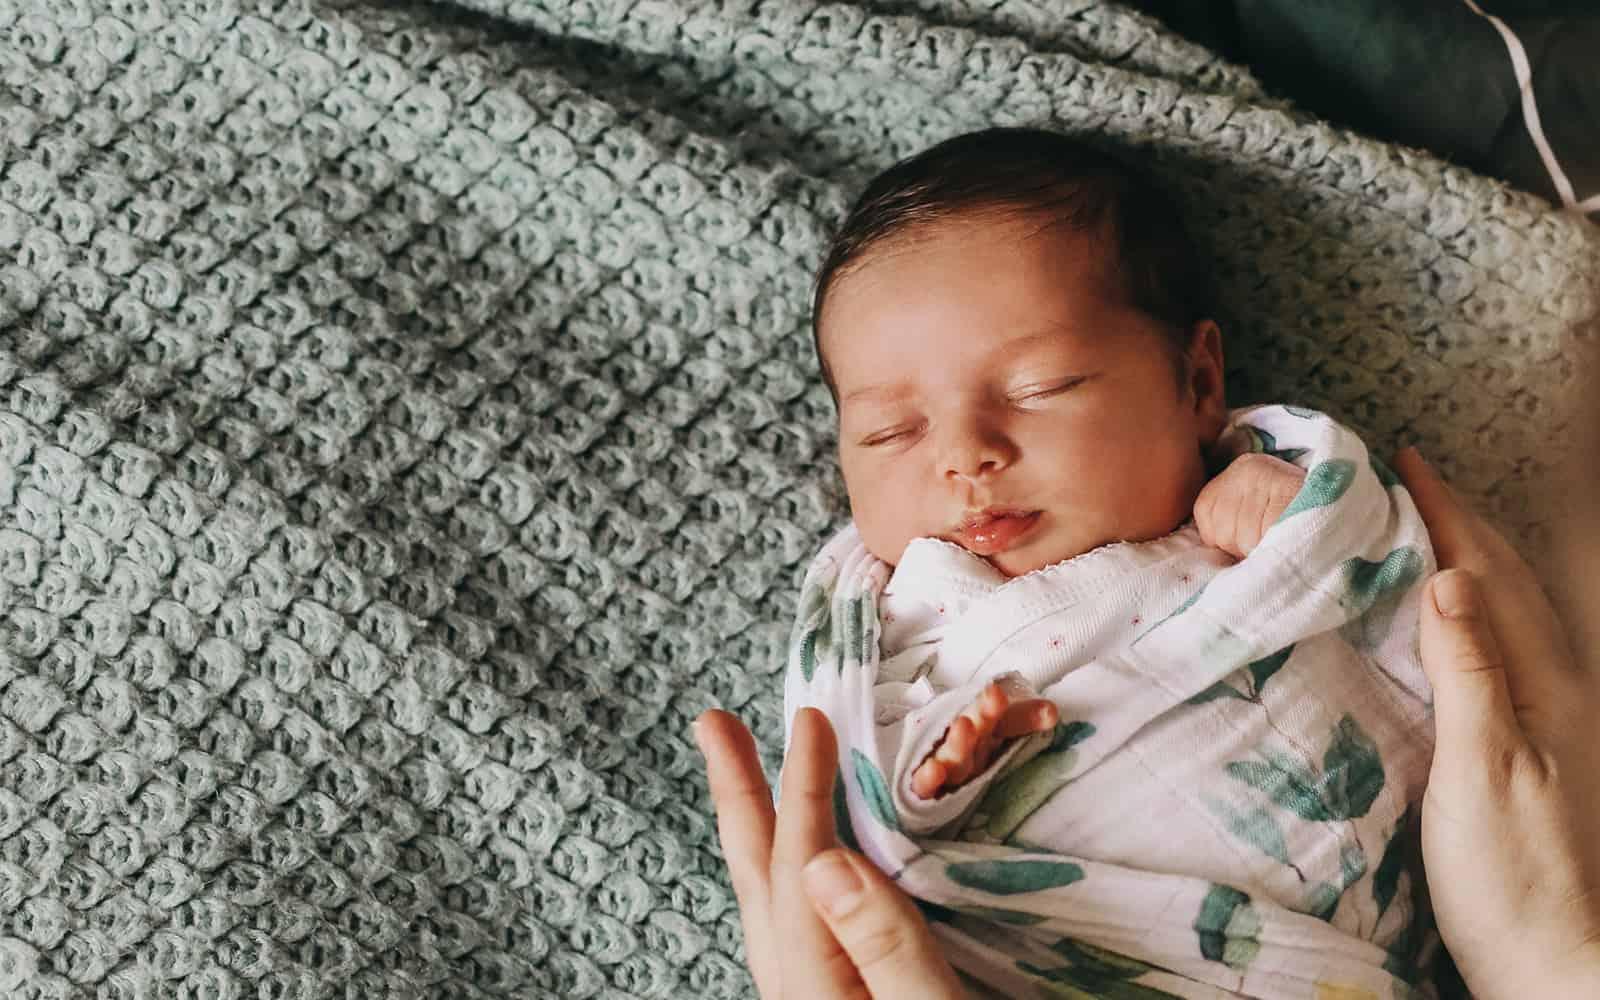 Newborn baby swaddled laying on blanket